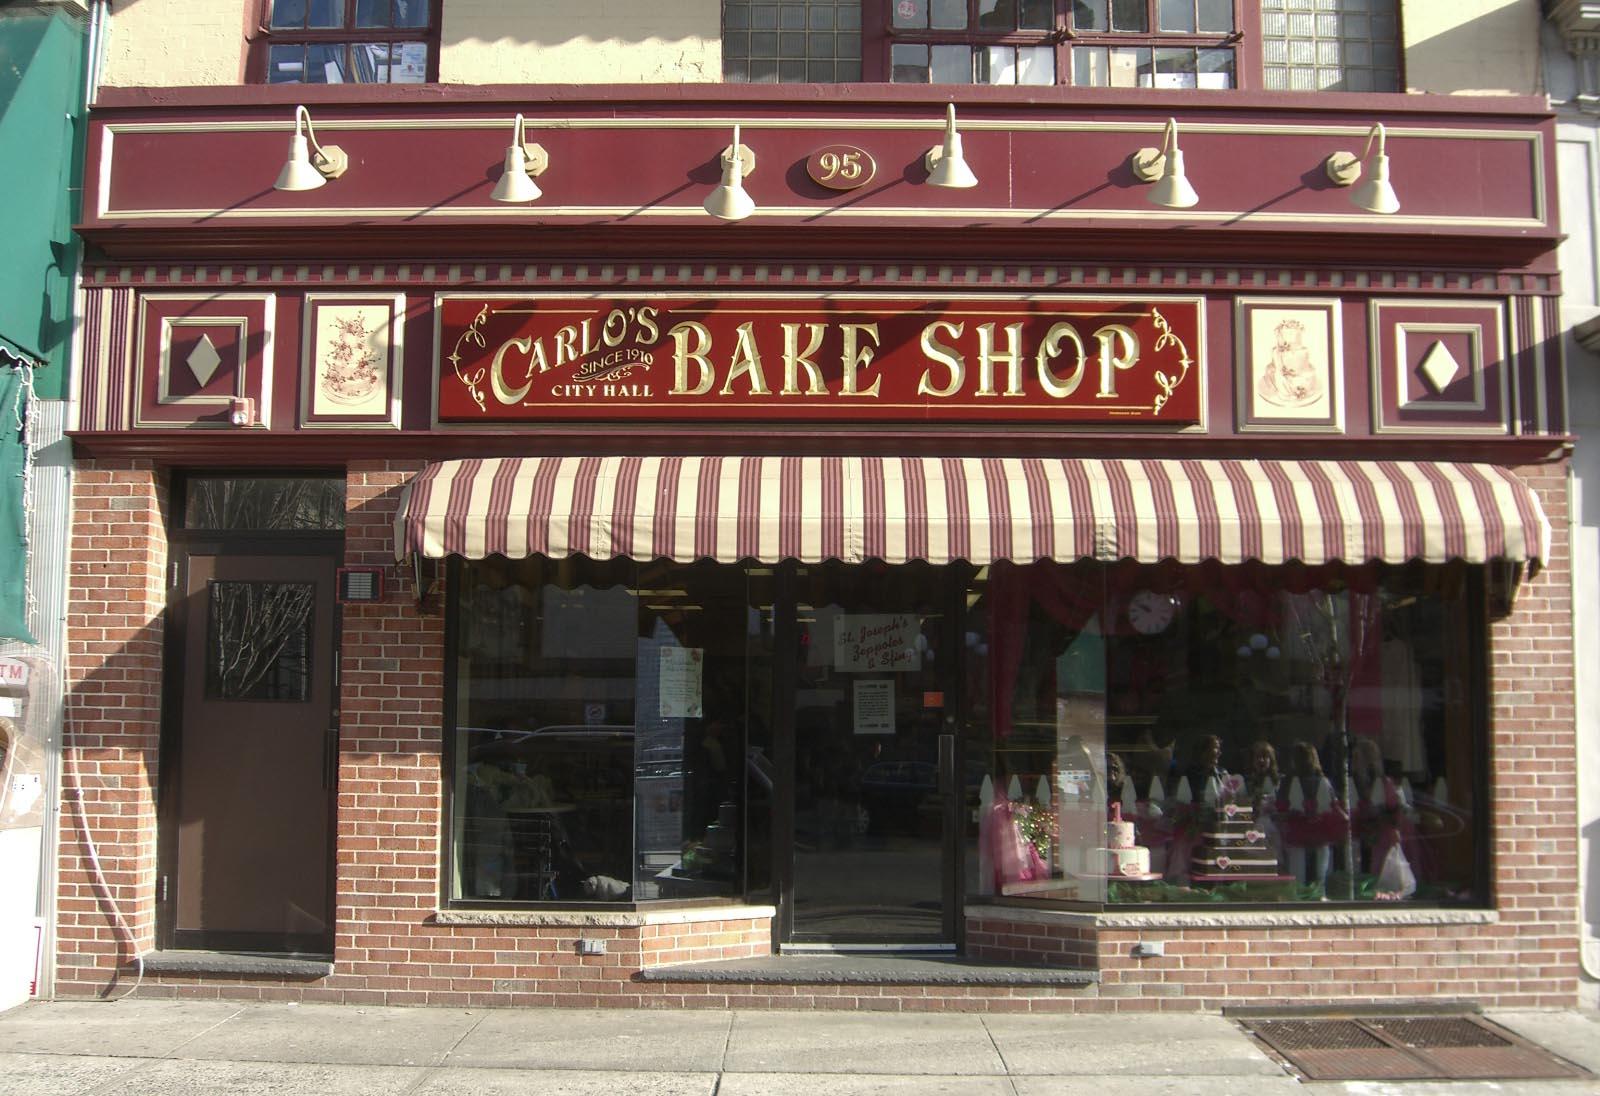 Carlos Bake Shop in Hoboken New Jersey where the series is filmed 1600x1096